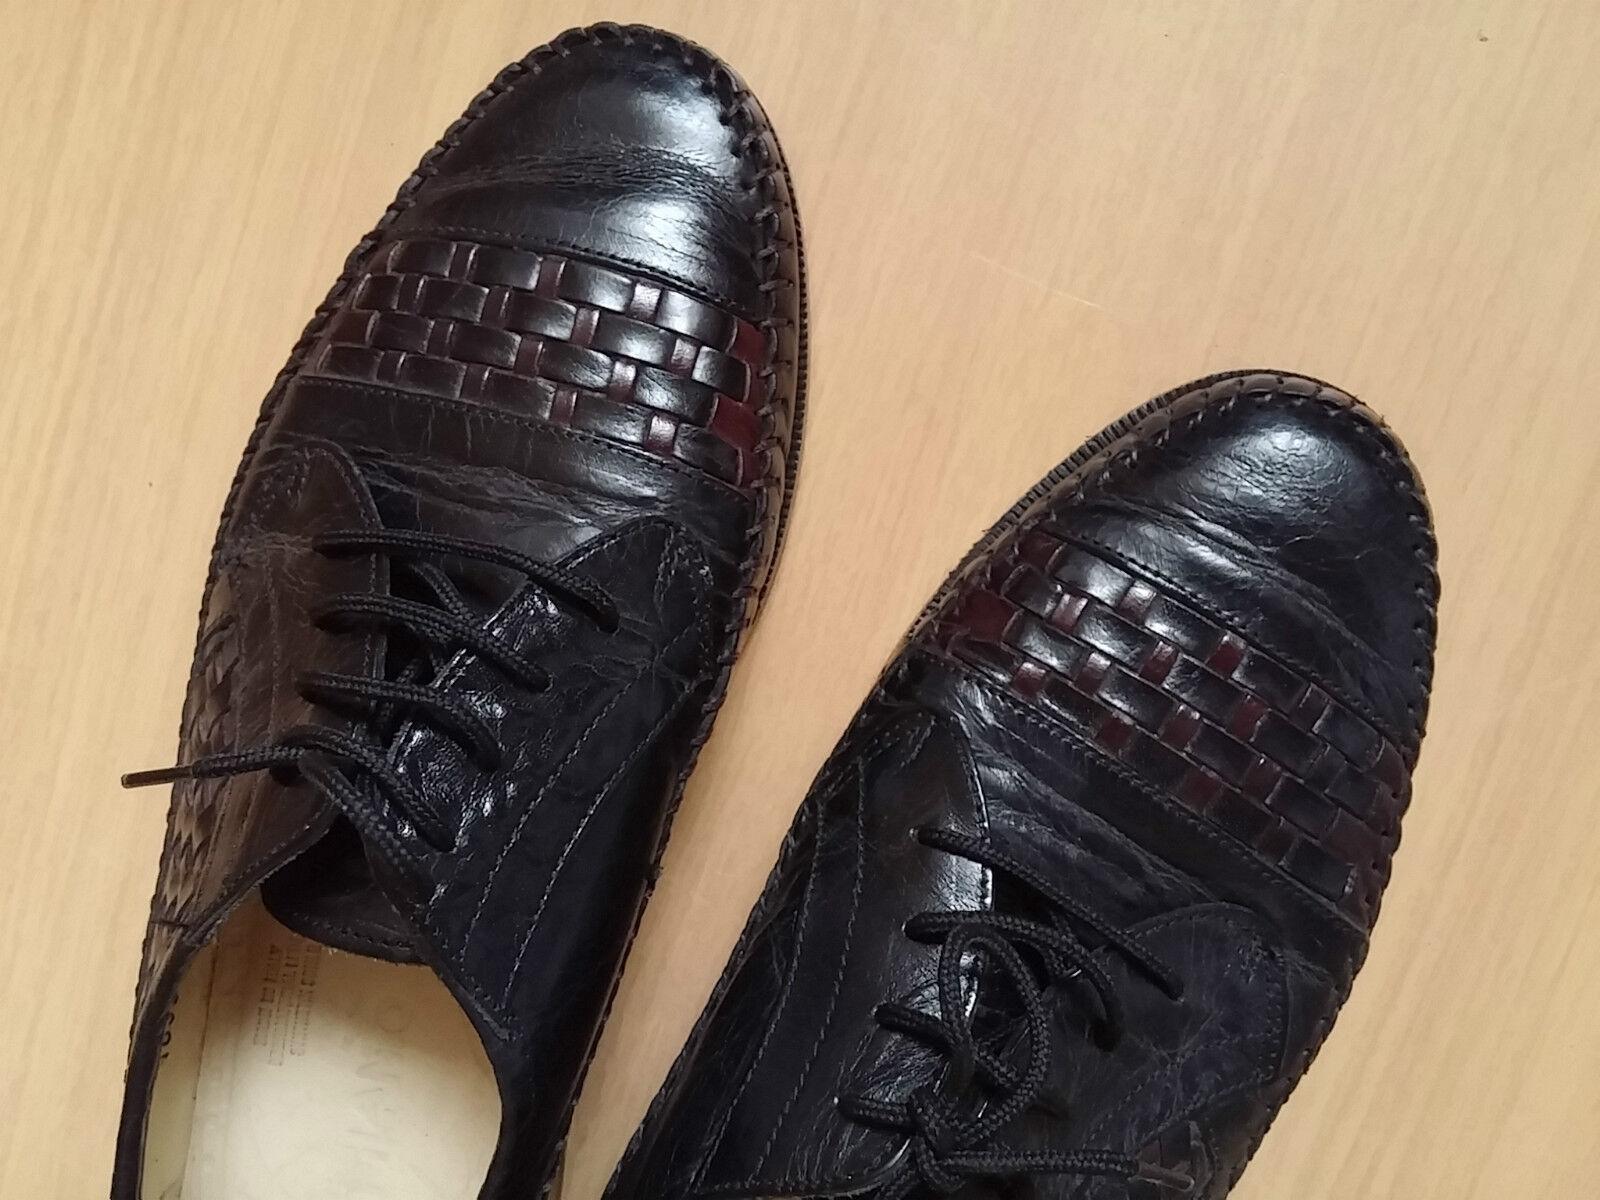 Herren 41 Schuhe Schnürer FILANTO Gr 41 Herren schwarz Leder Top 26251f